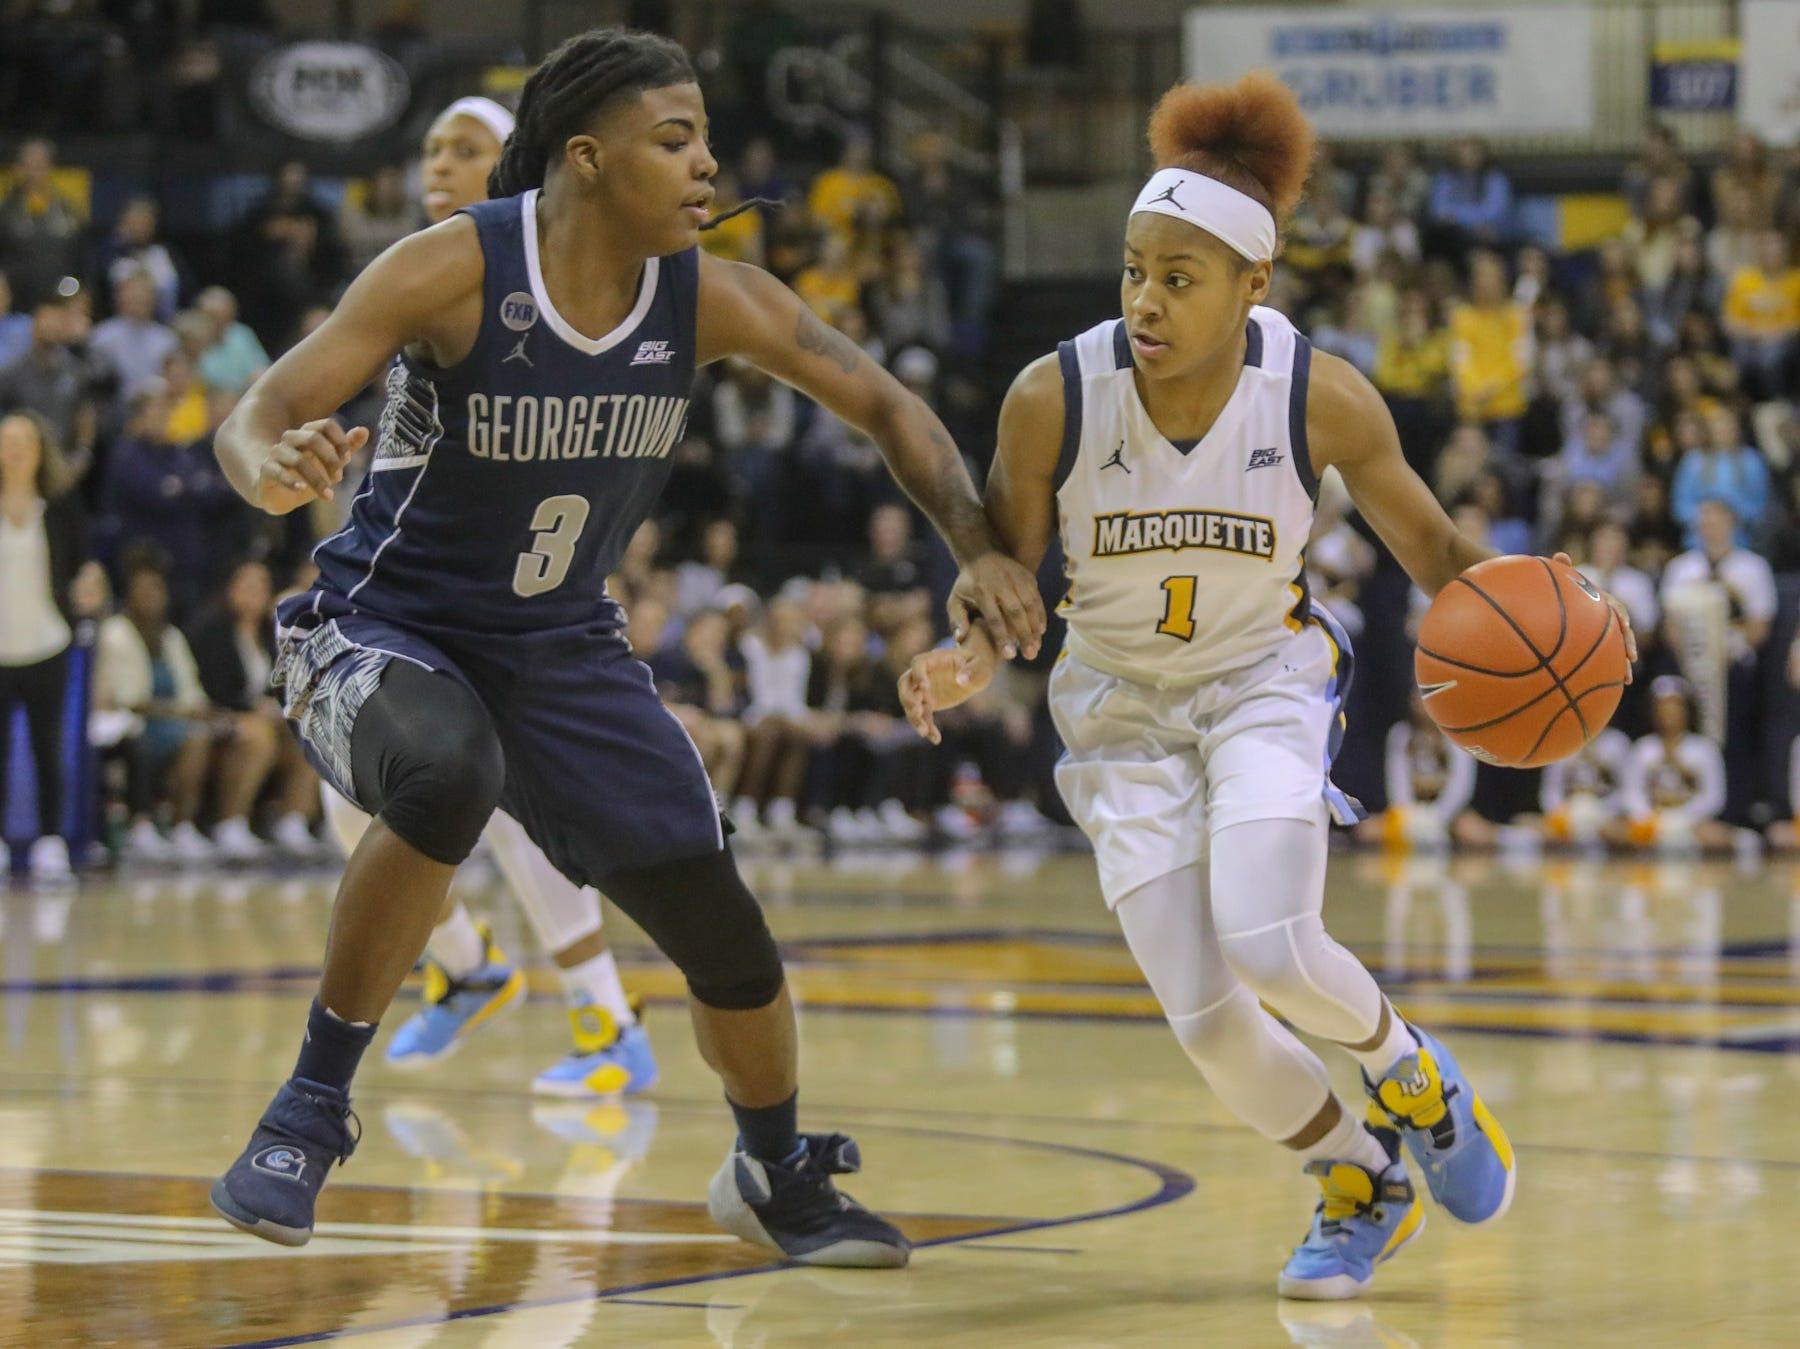 Marquette Women's Basketball vs. Georgetown